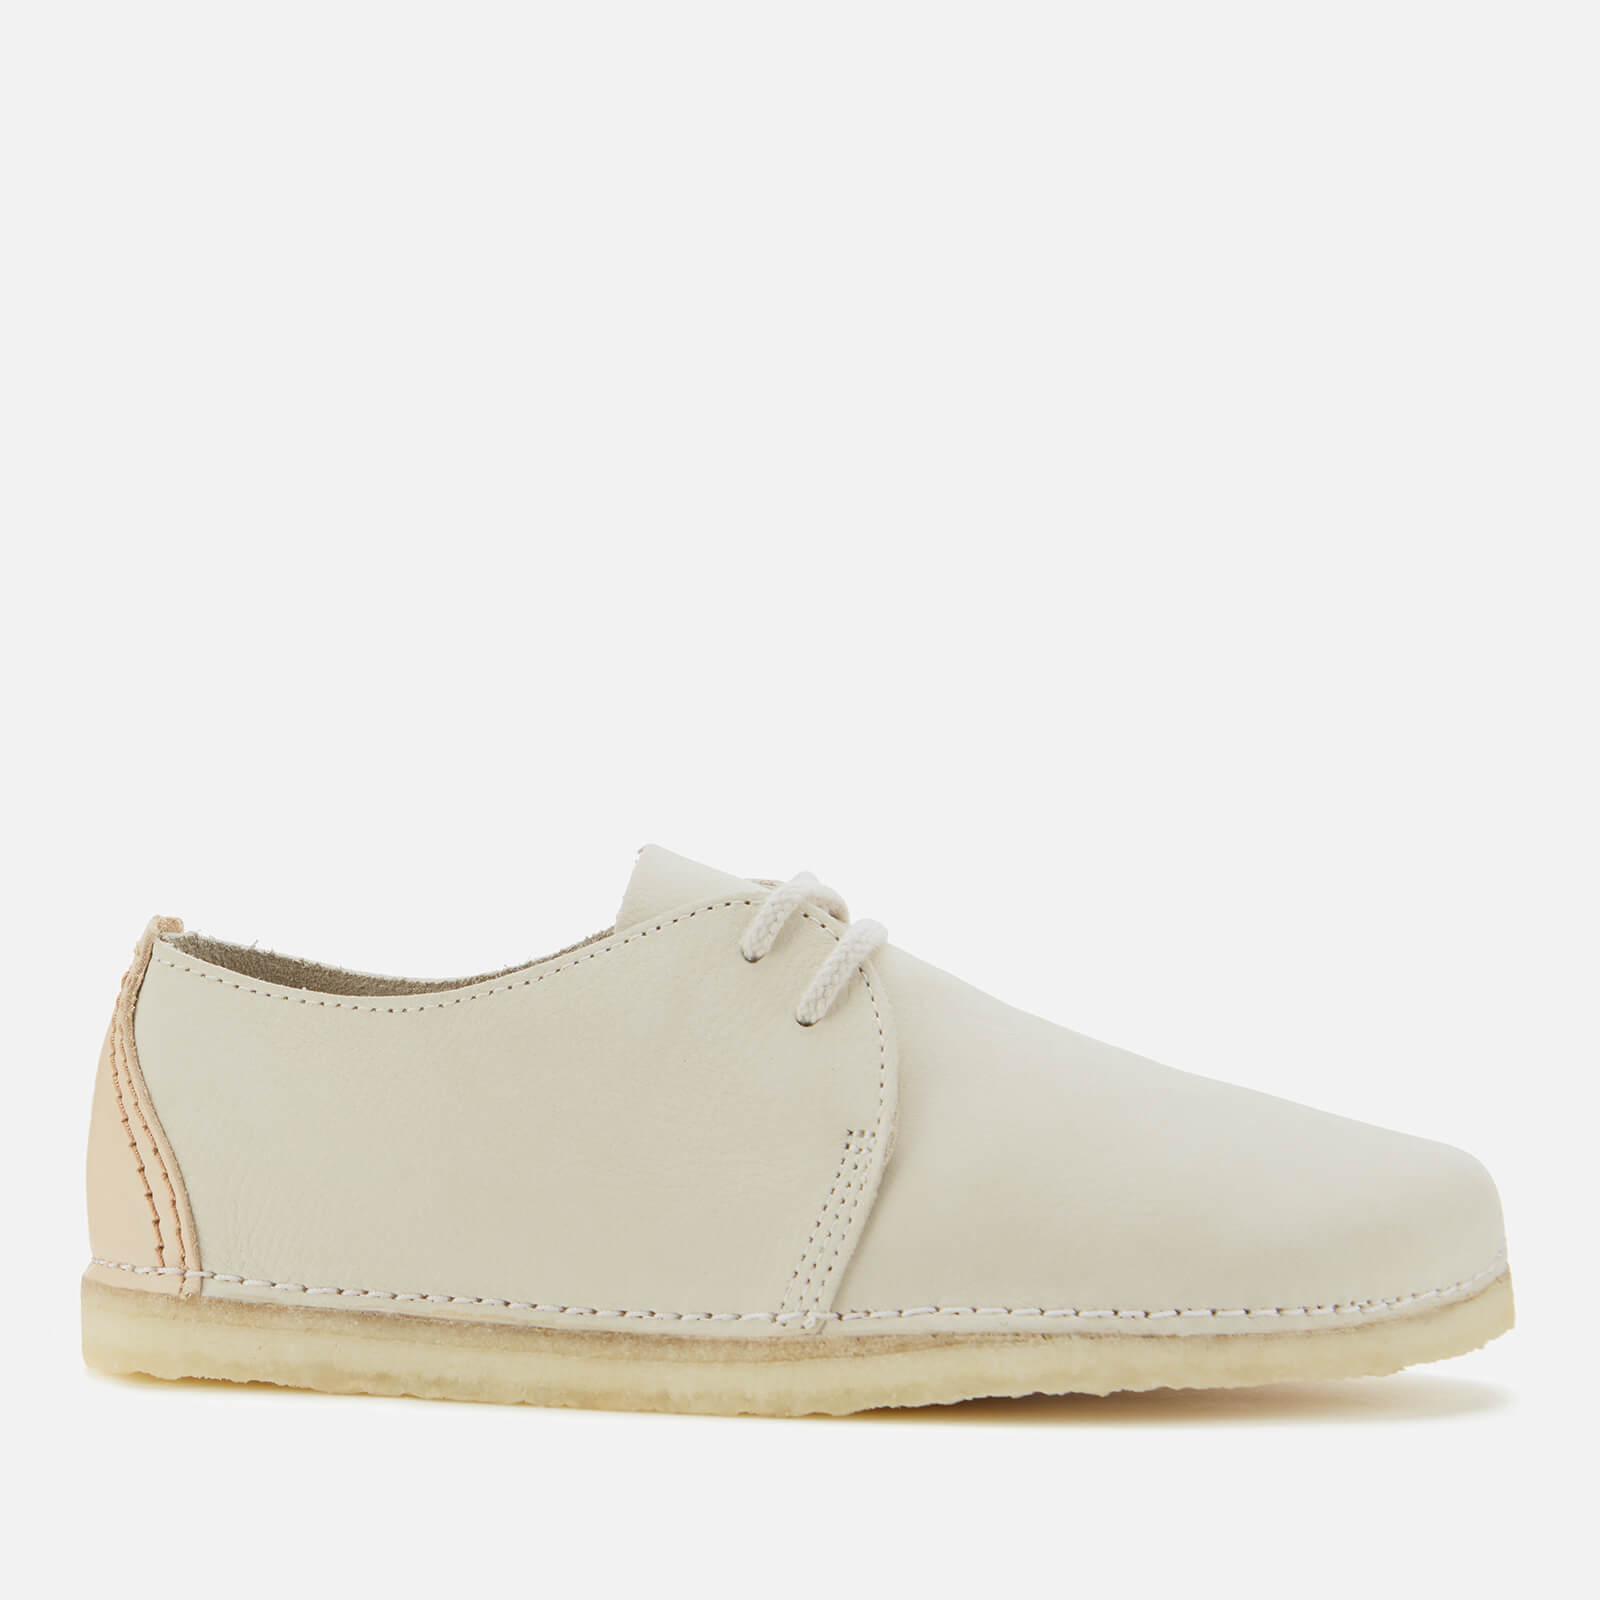 Clarks Originals Women's Ashton Nubuck Flat Shoes - Off White - UK 3